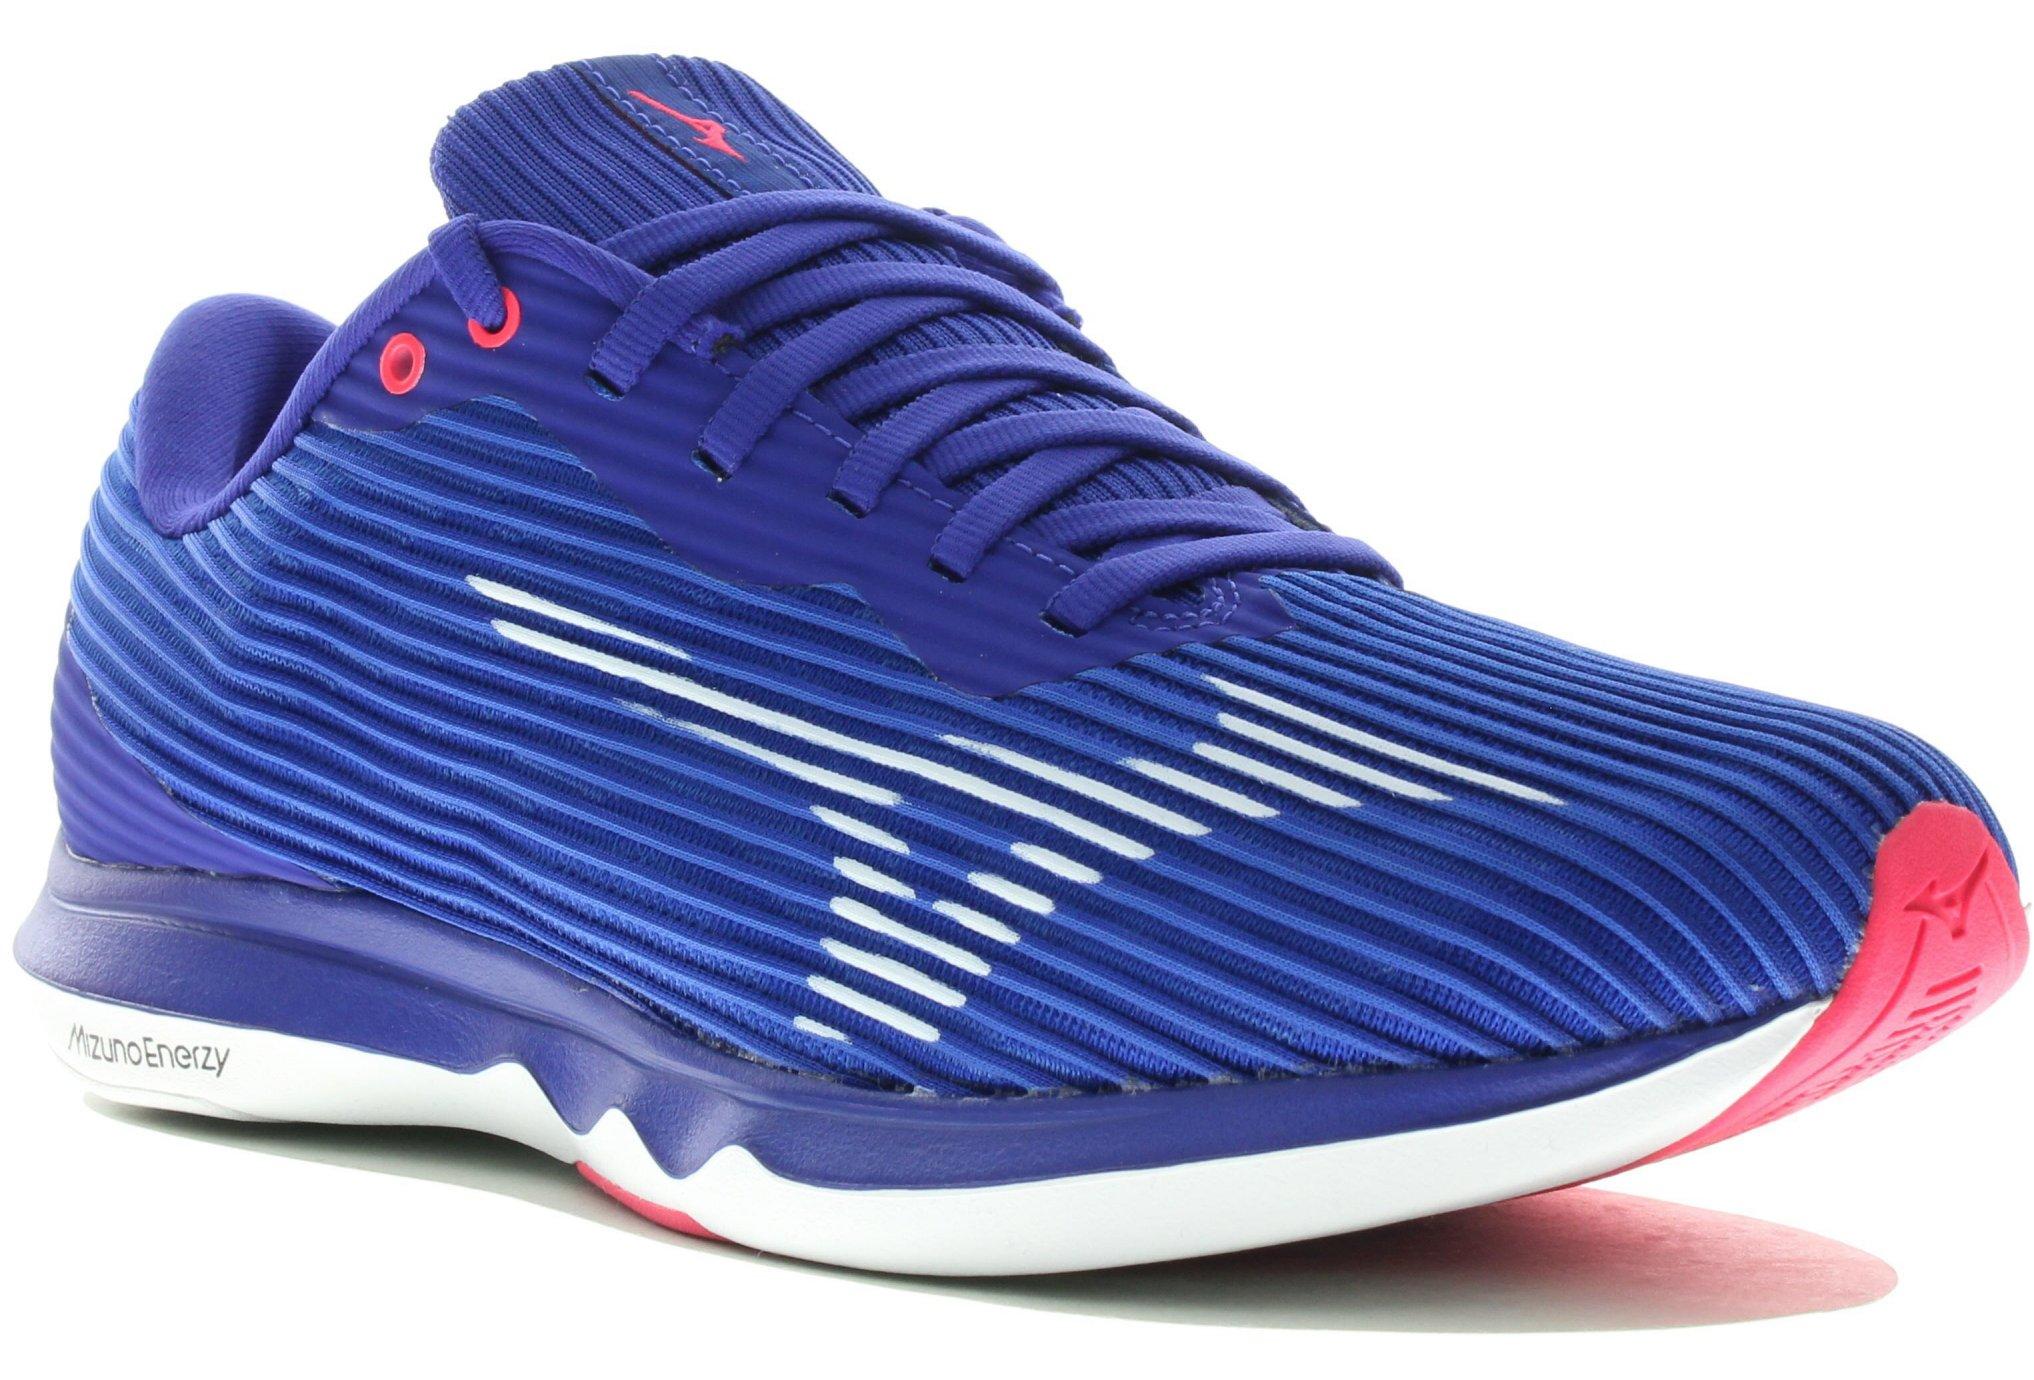 Mizuno Wave Shadow 4 Chaussures homme